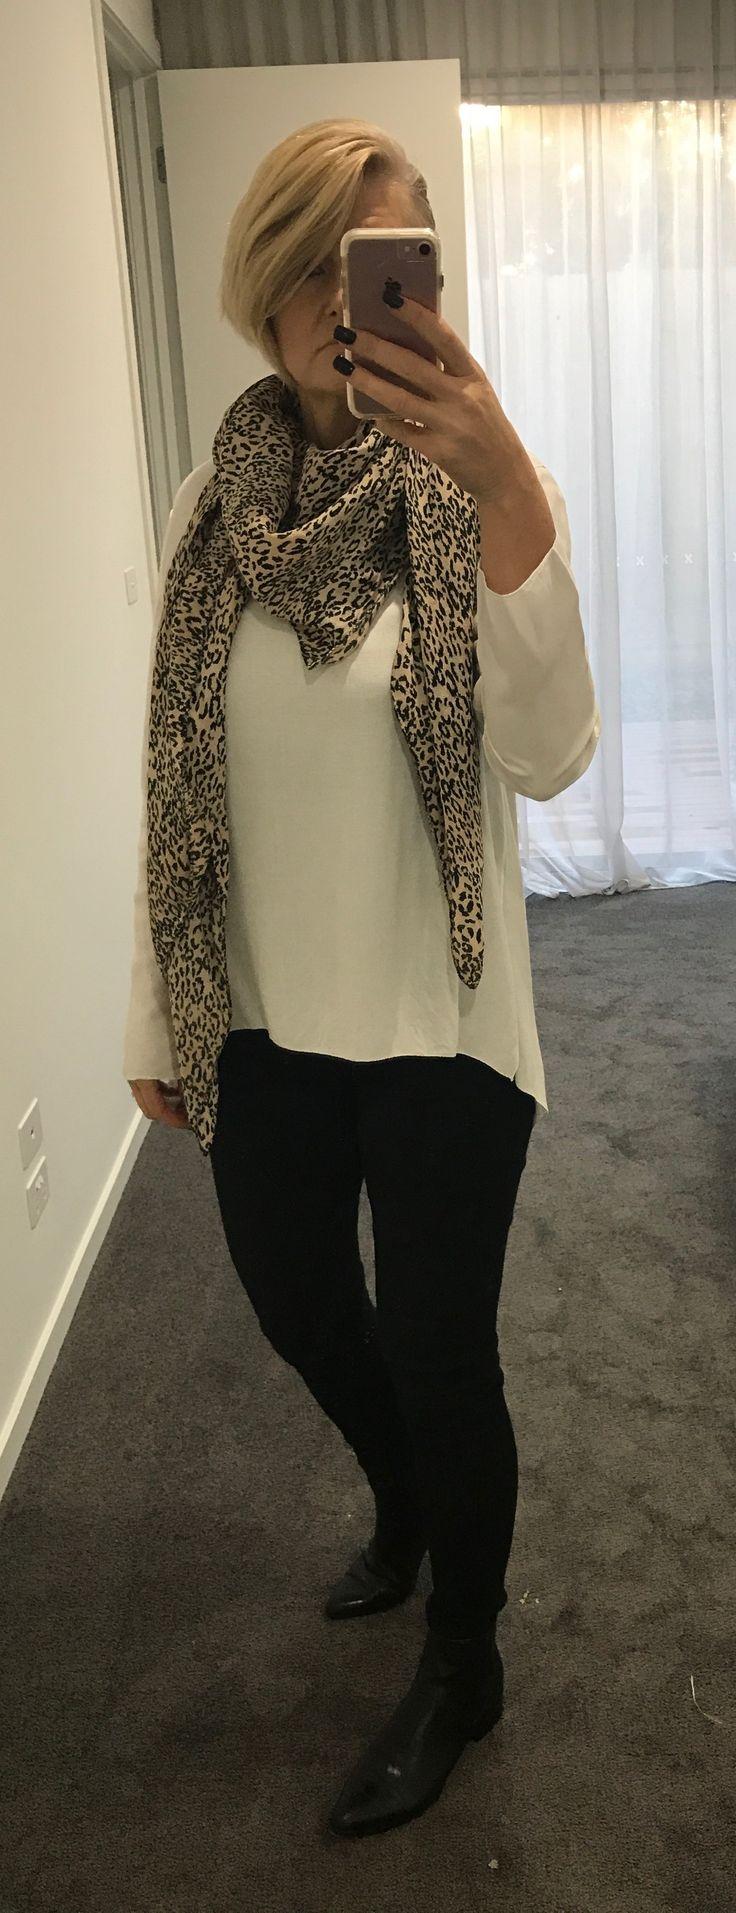 Leopard print scarf worn again today - love leopard this season.  Read why at cazinc.com.au.